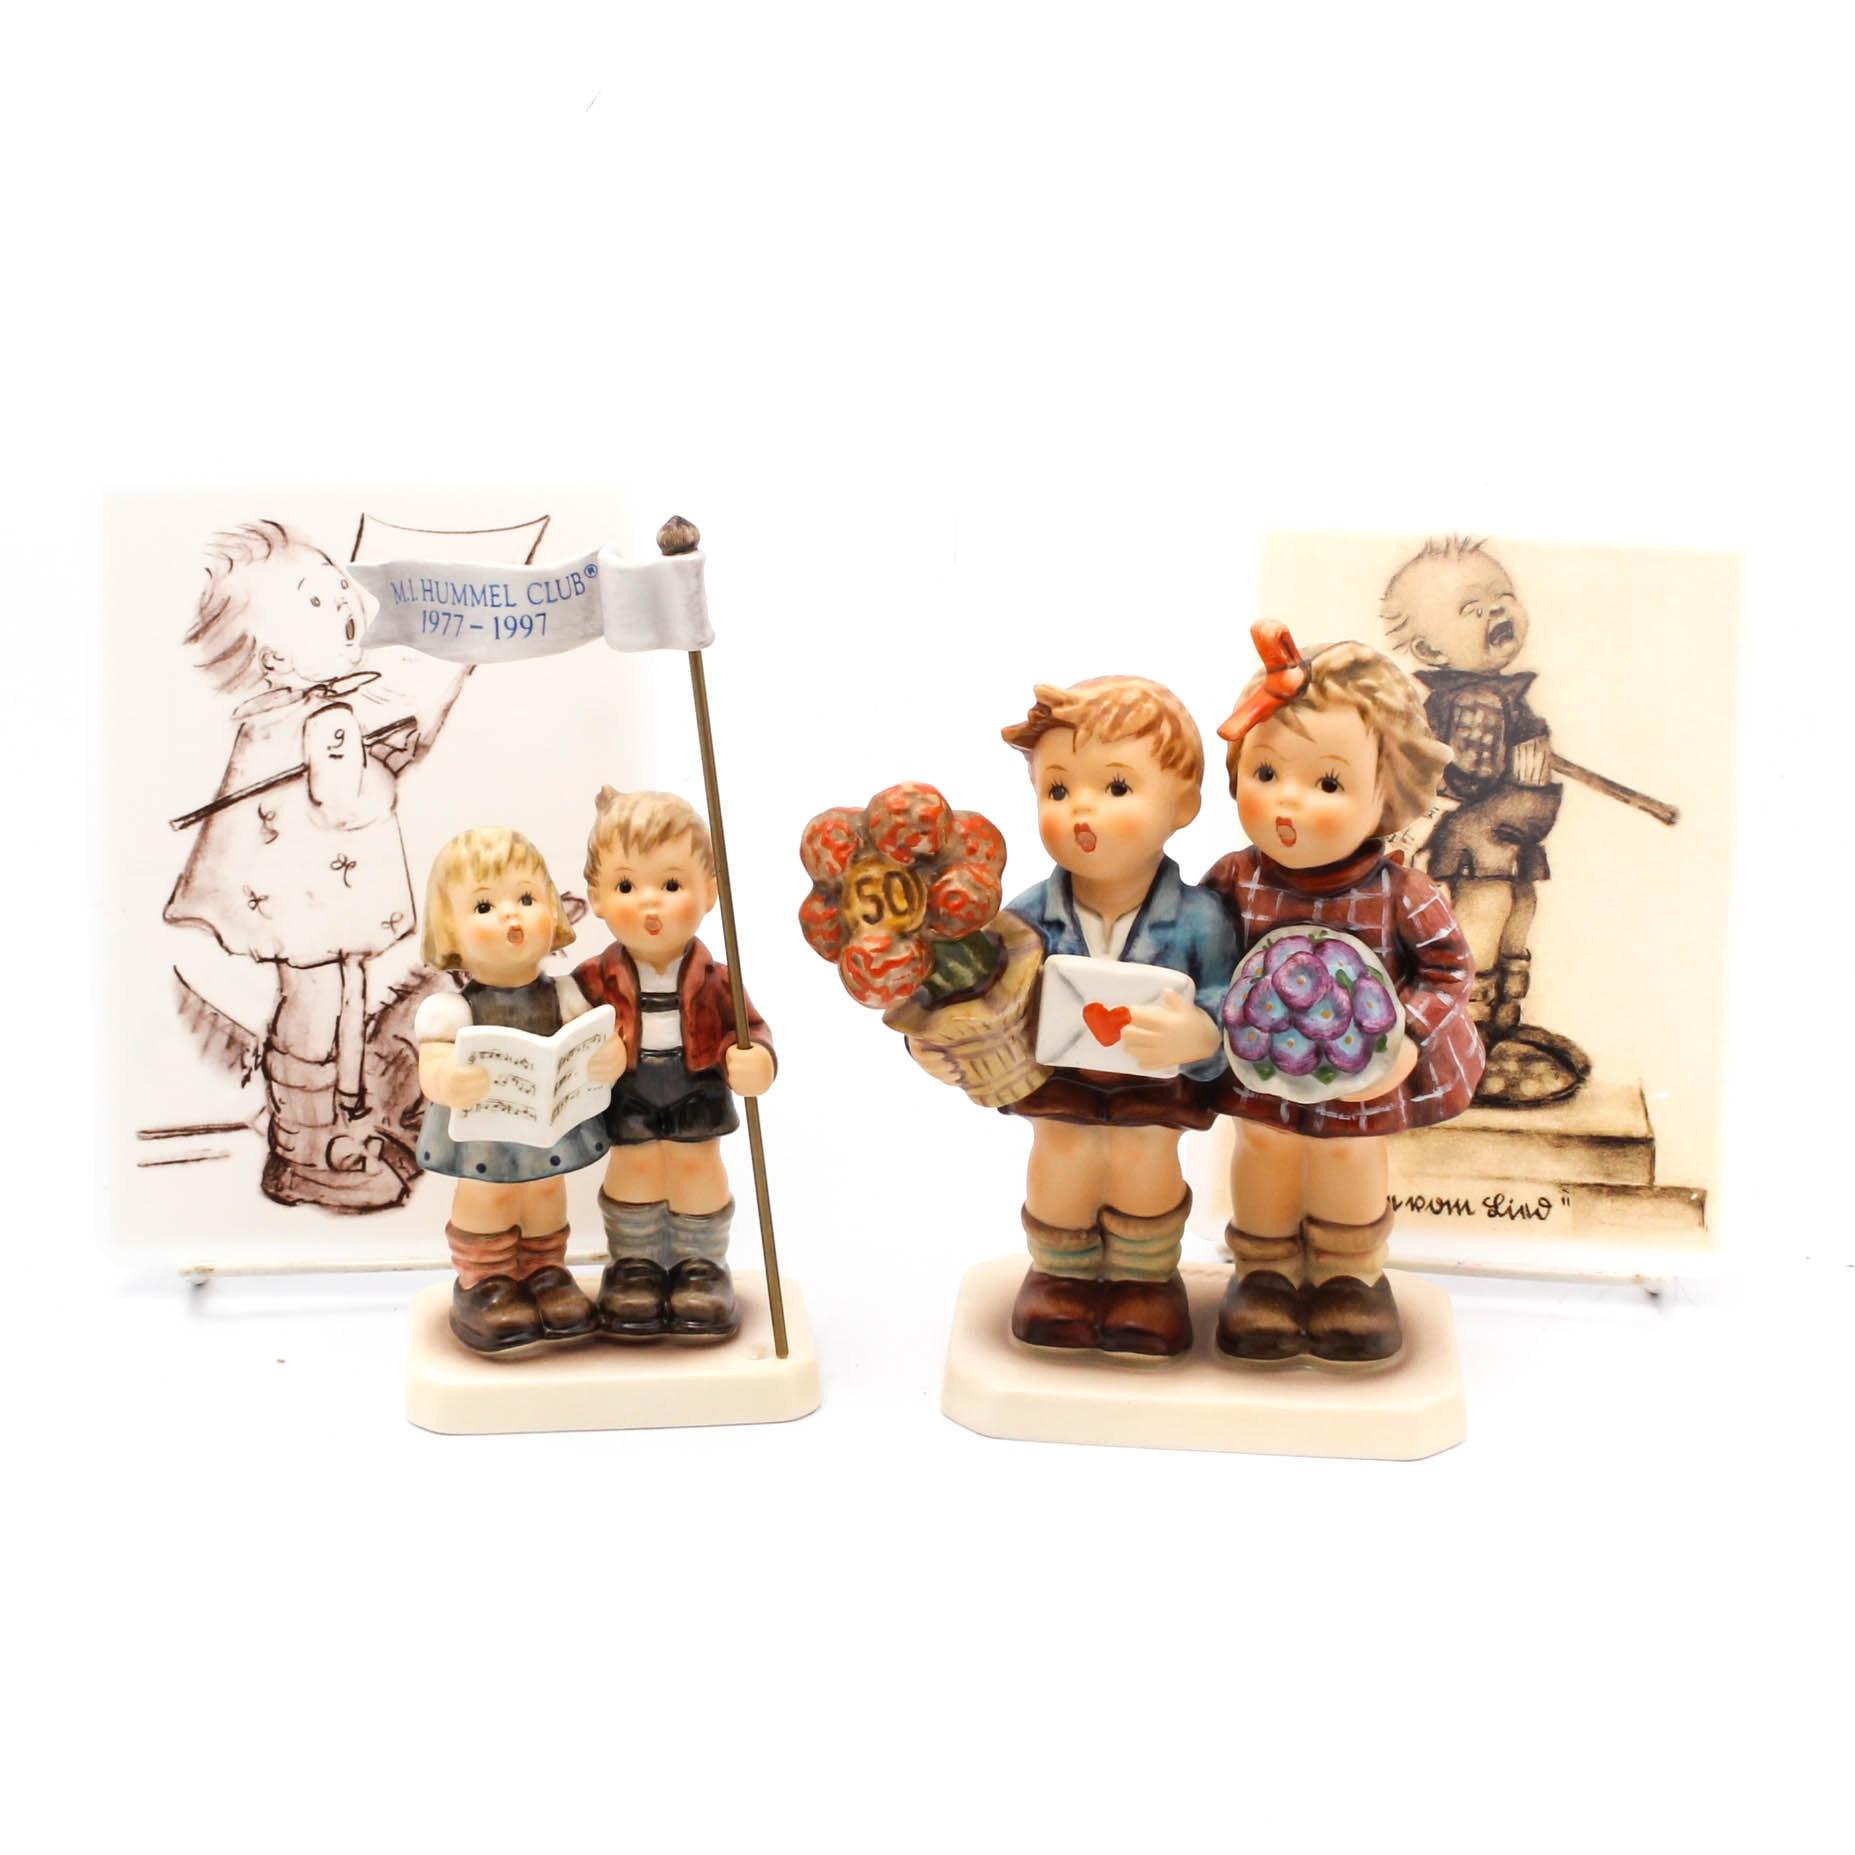 Pair of Hummel Figurines